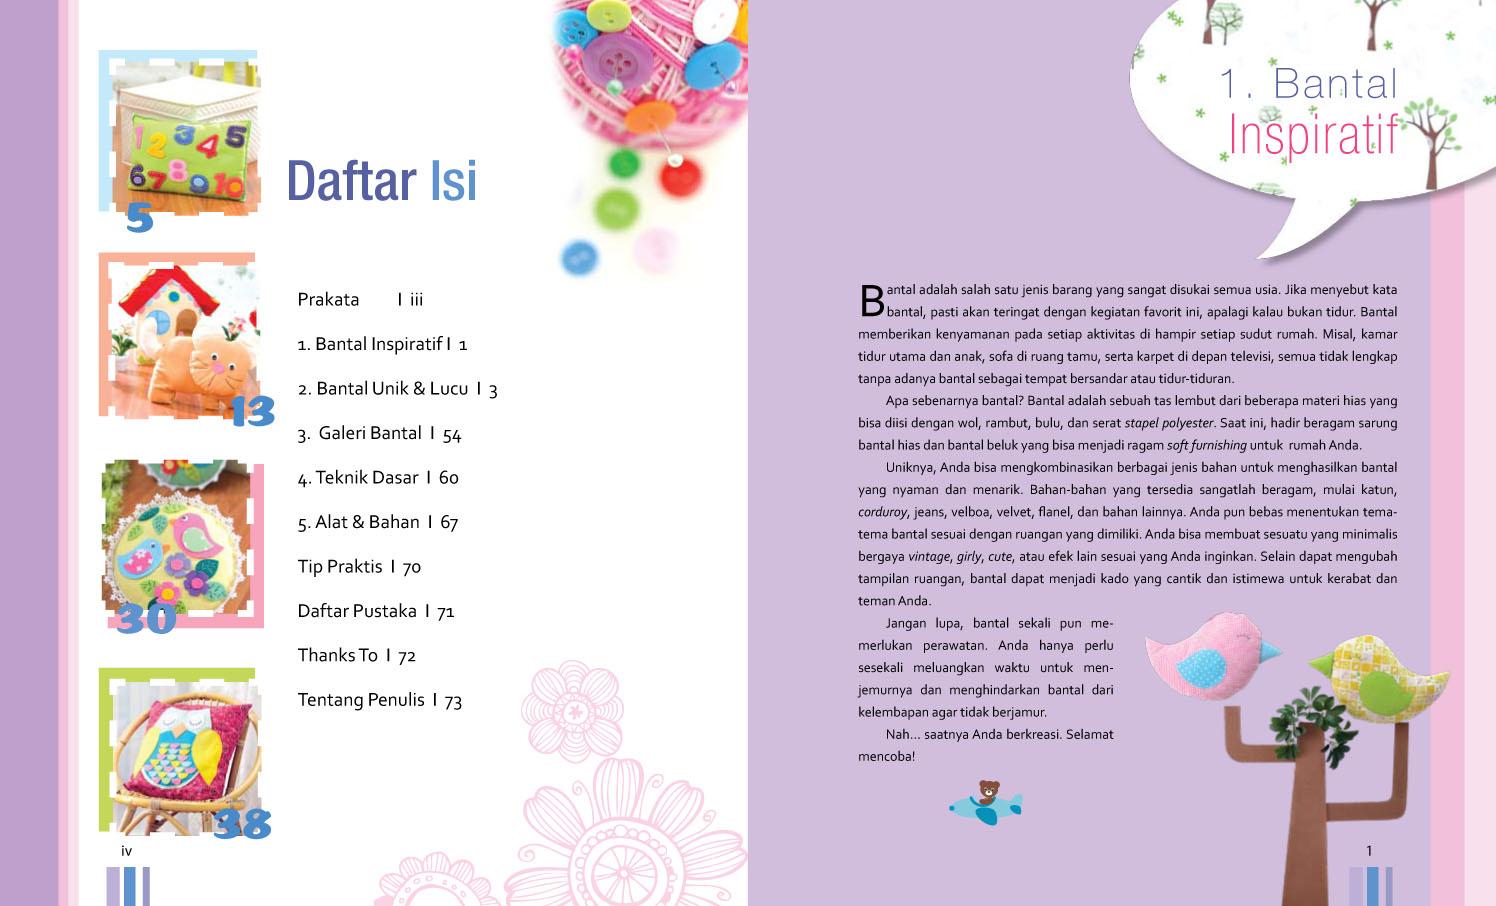 Capungmungil My Second Craft Book 2 Bantal Unik Dan Lucu